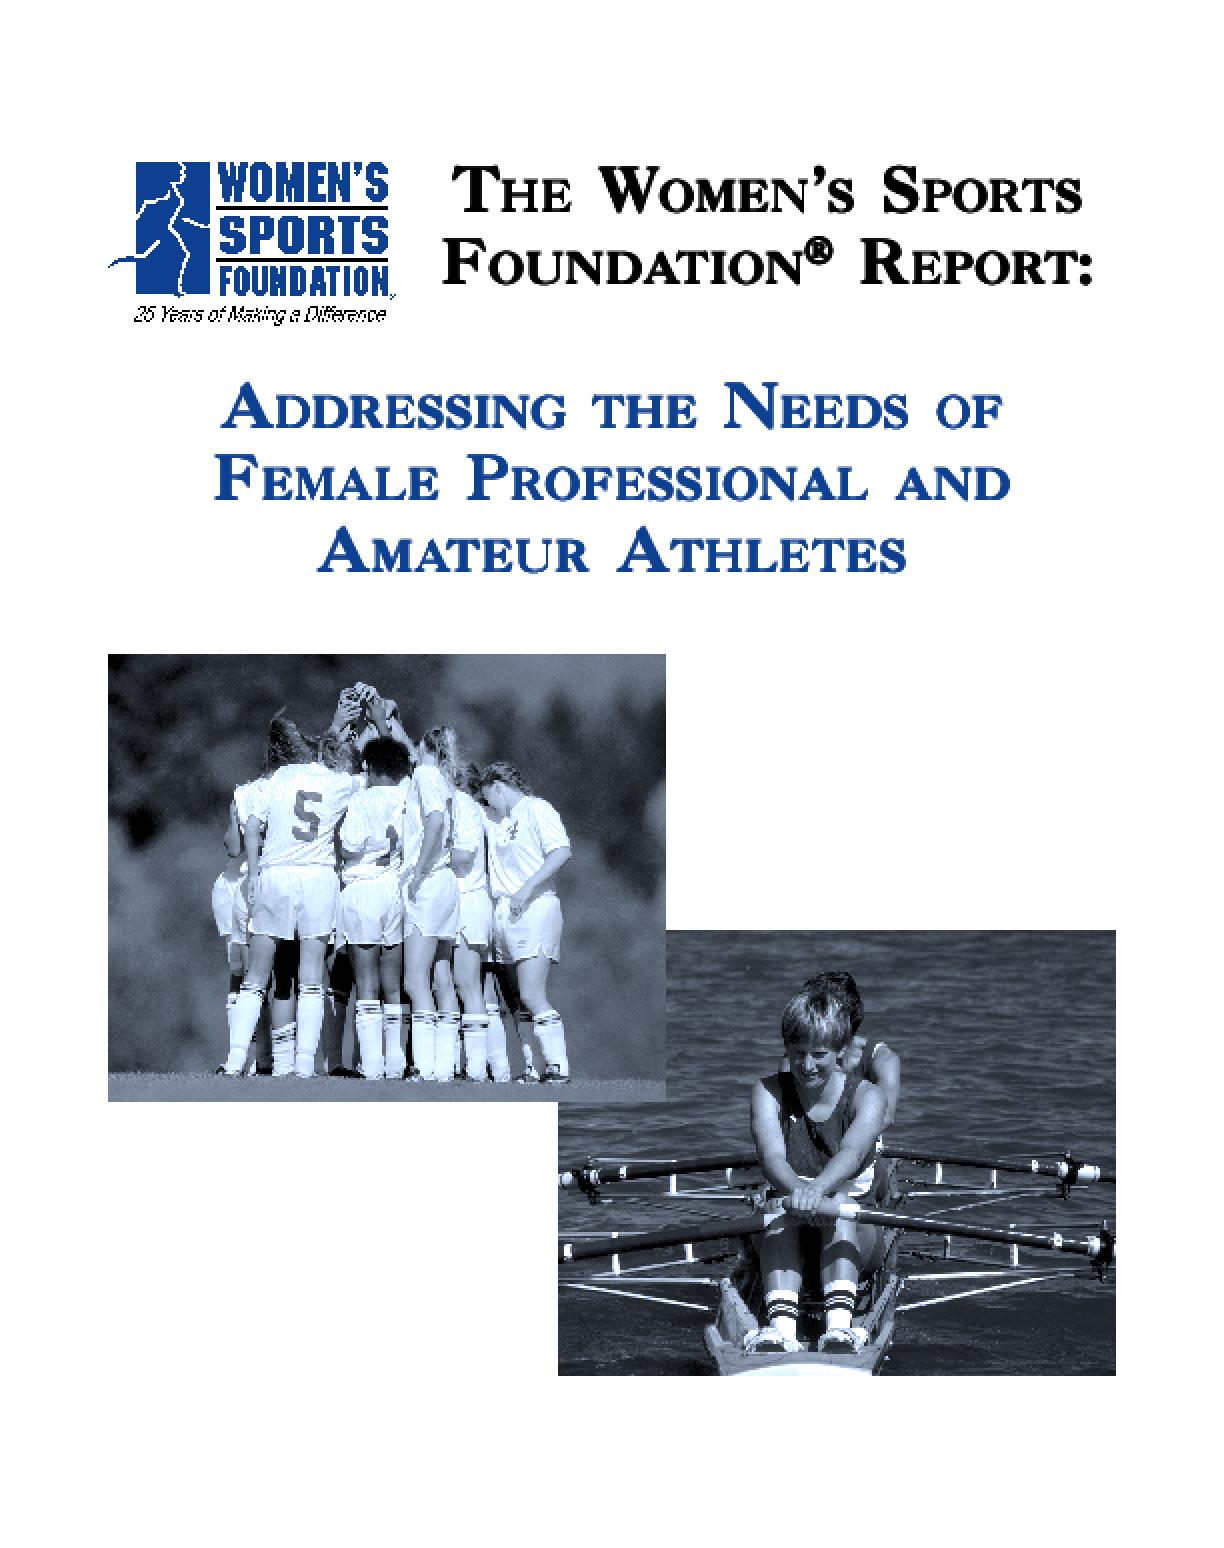 Addressing the Needs of Female Professional and Amateur Athletes